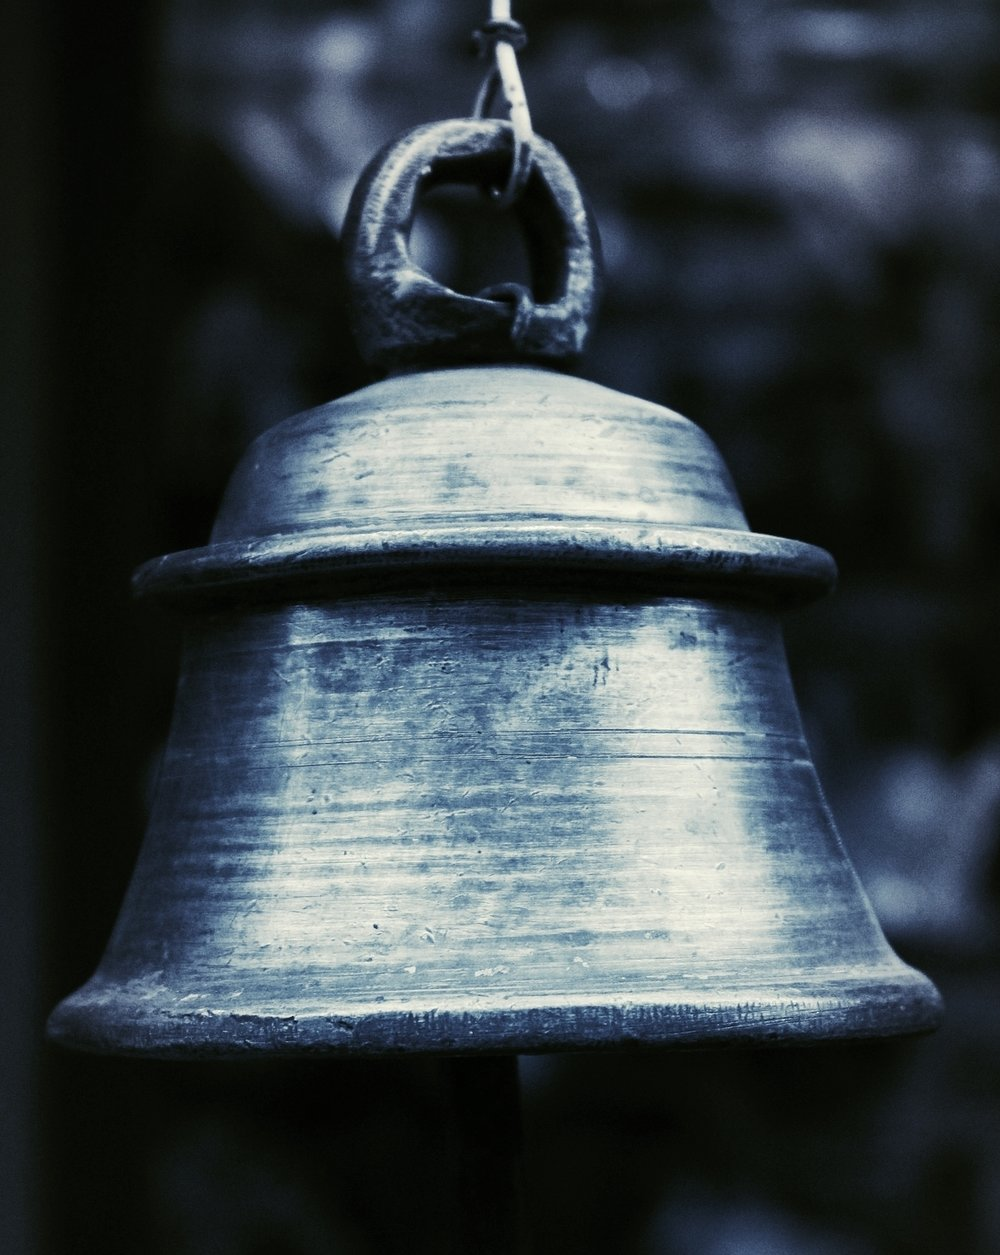 sound-installation-bell.jpg